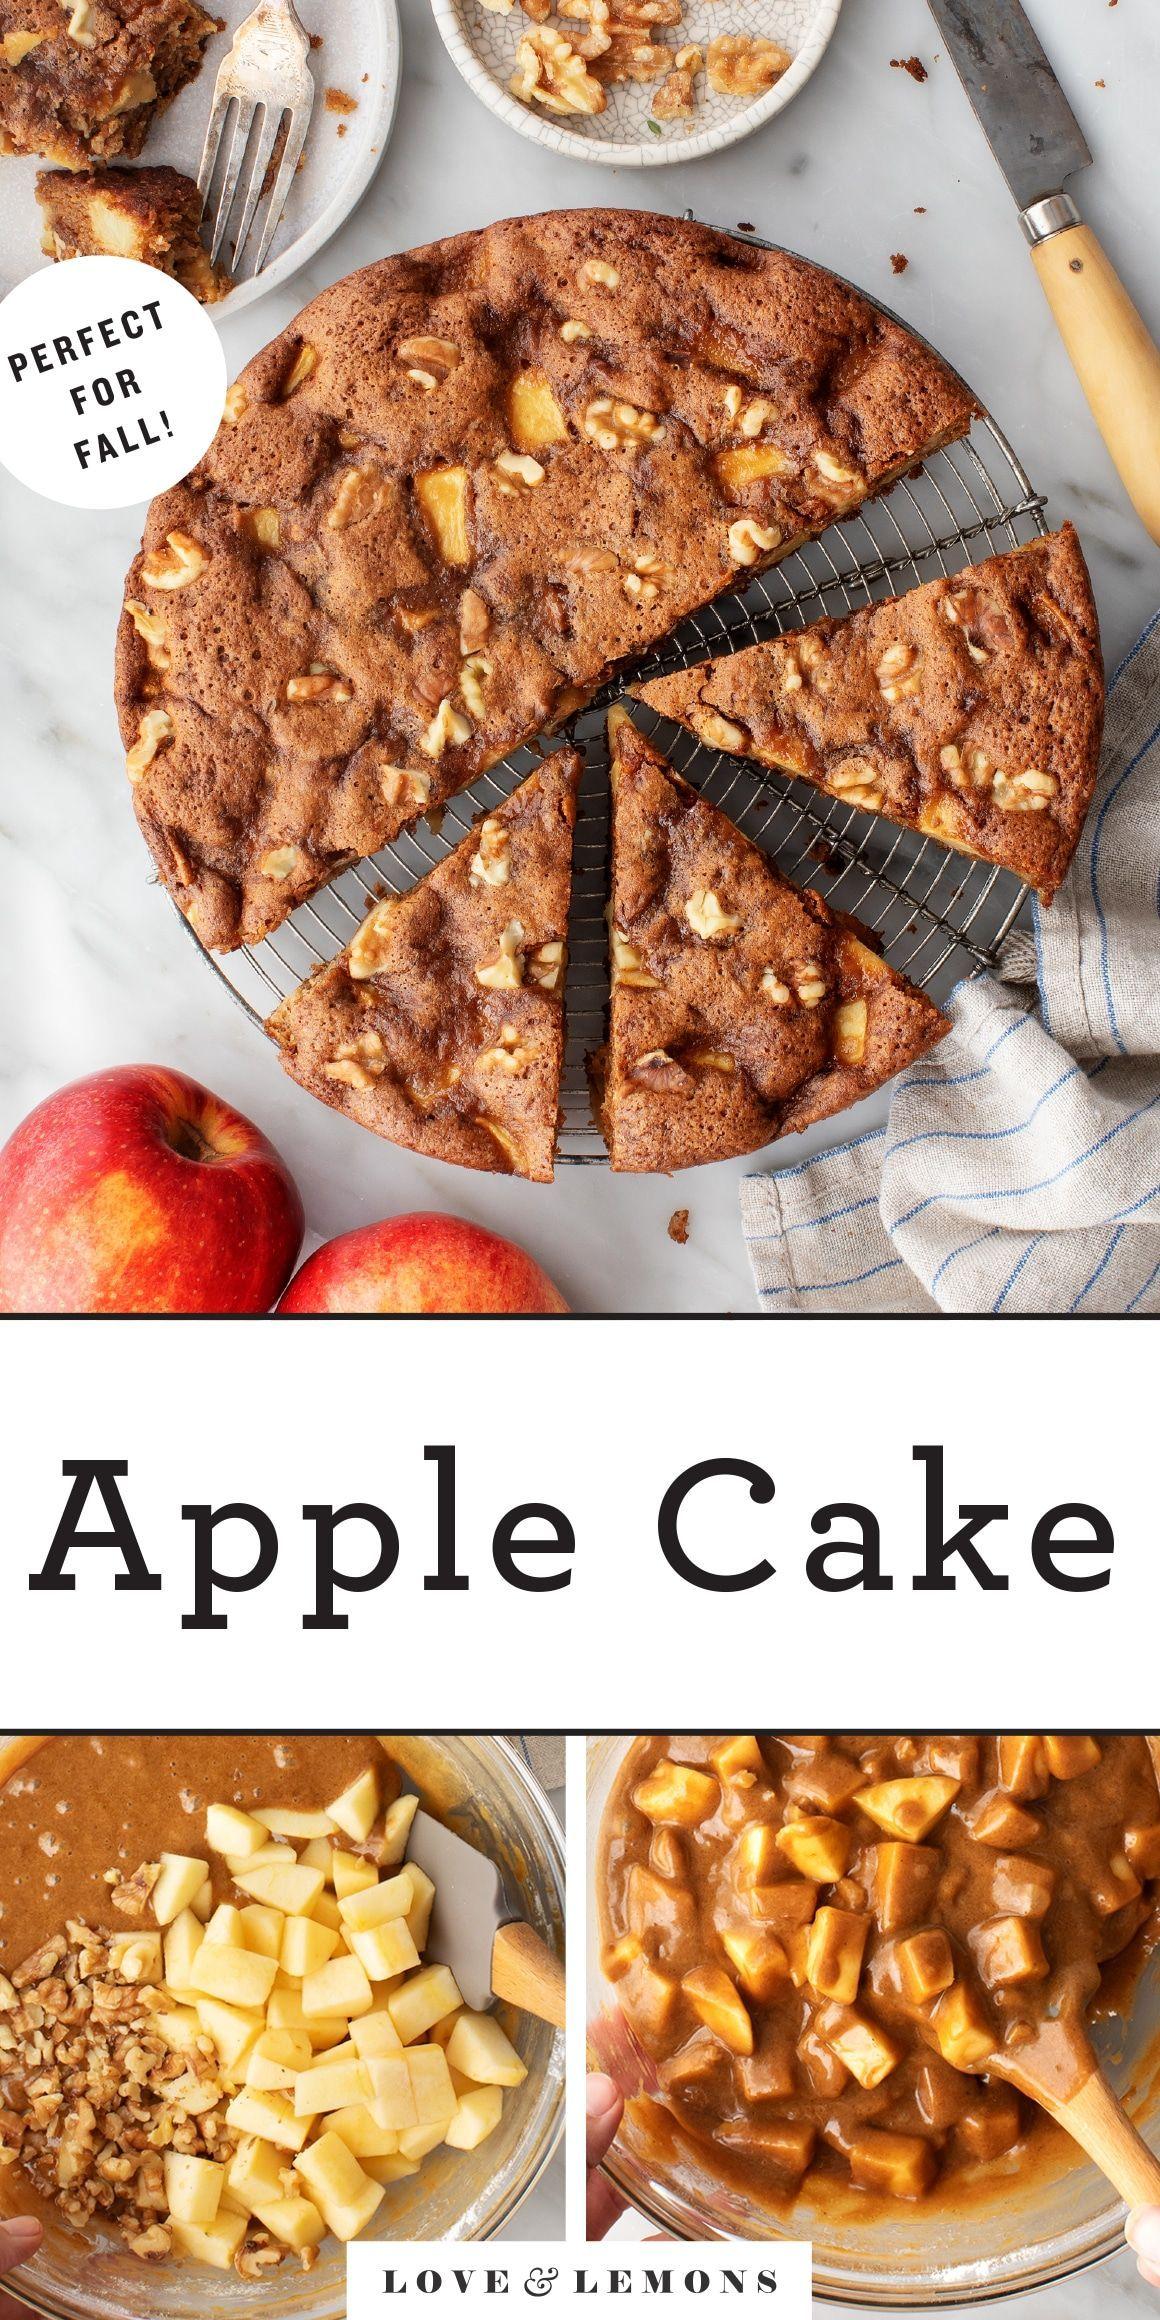 Apple Cake Love And Lemons Recipe Recipes Apple Cake Recipes Apple Cake